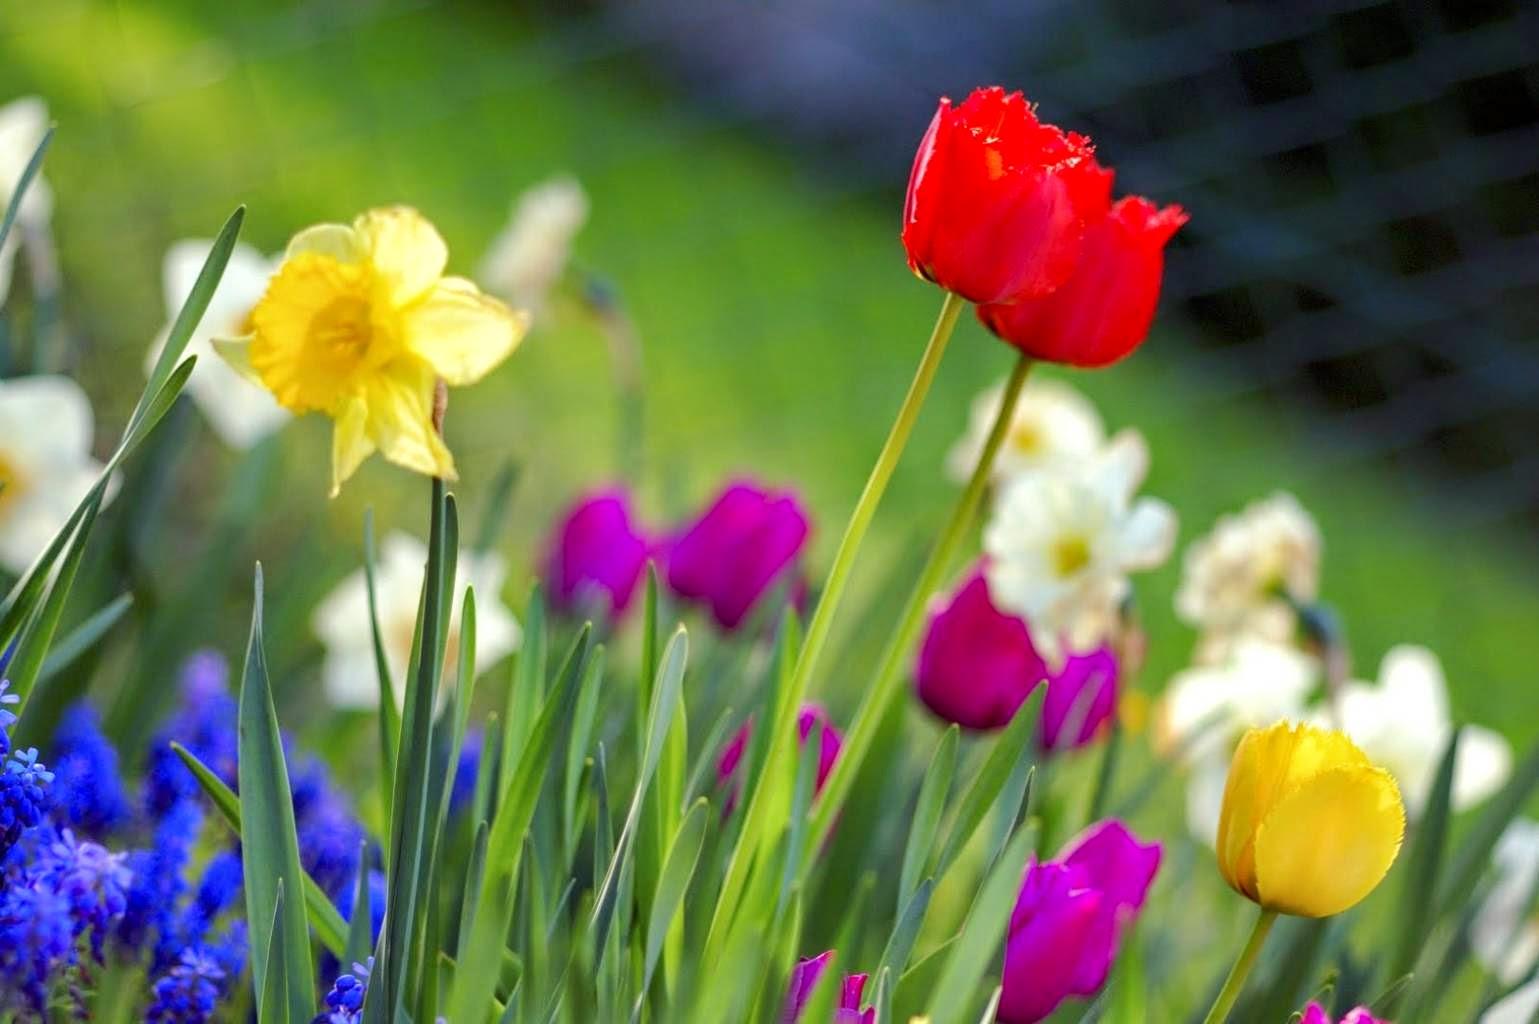 Spring flowers pictures spring flowers pictures spring flowers pictures and names mightylinksfo